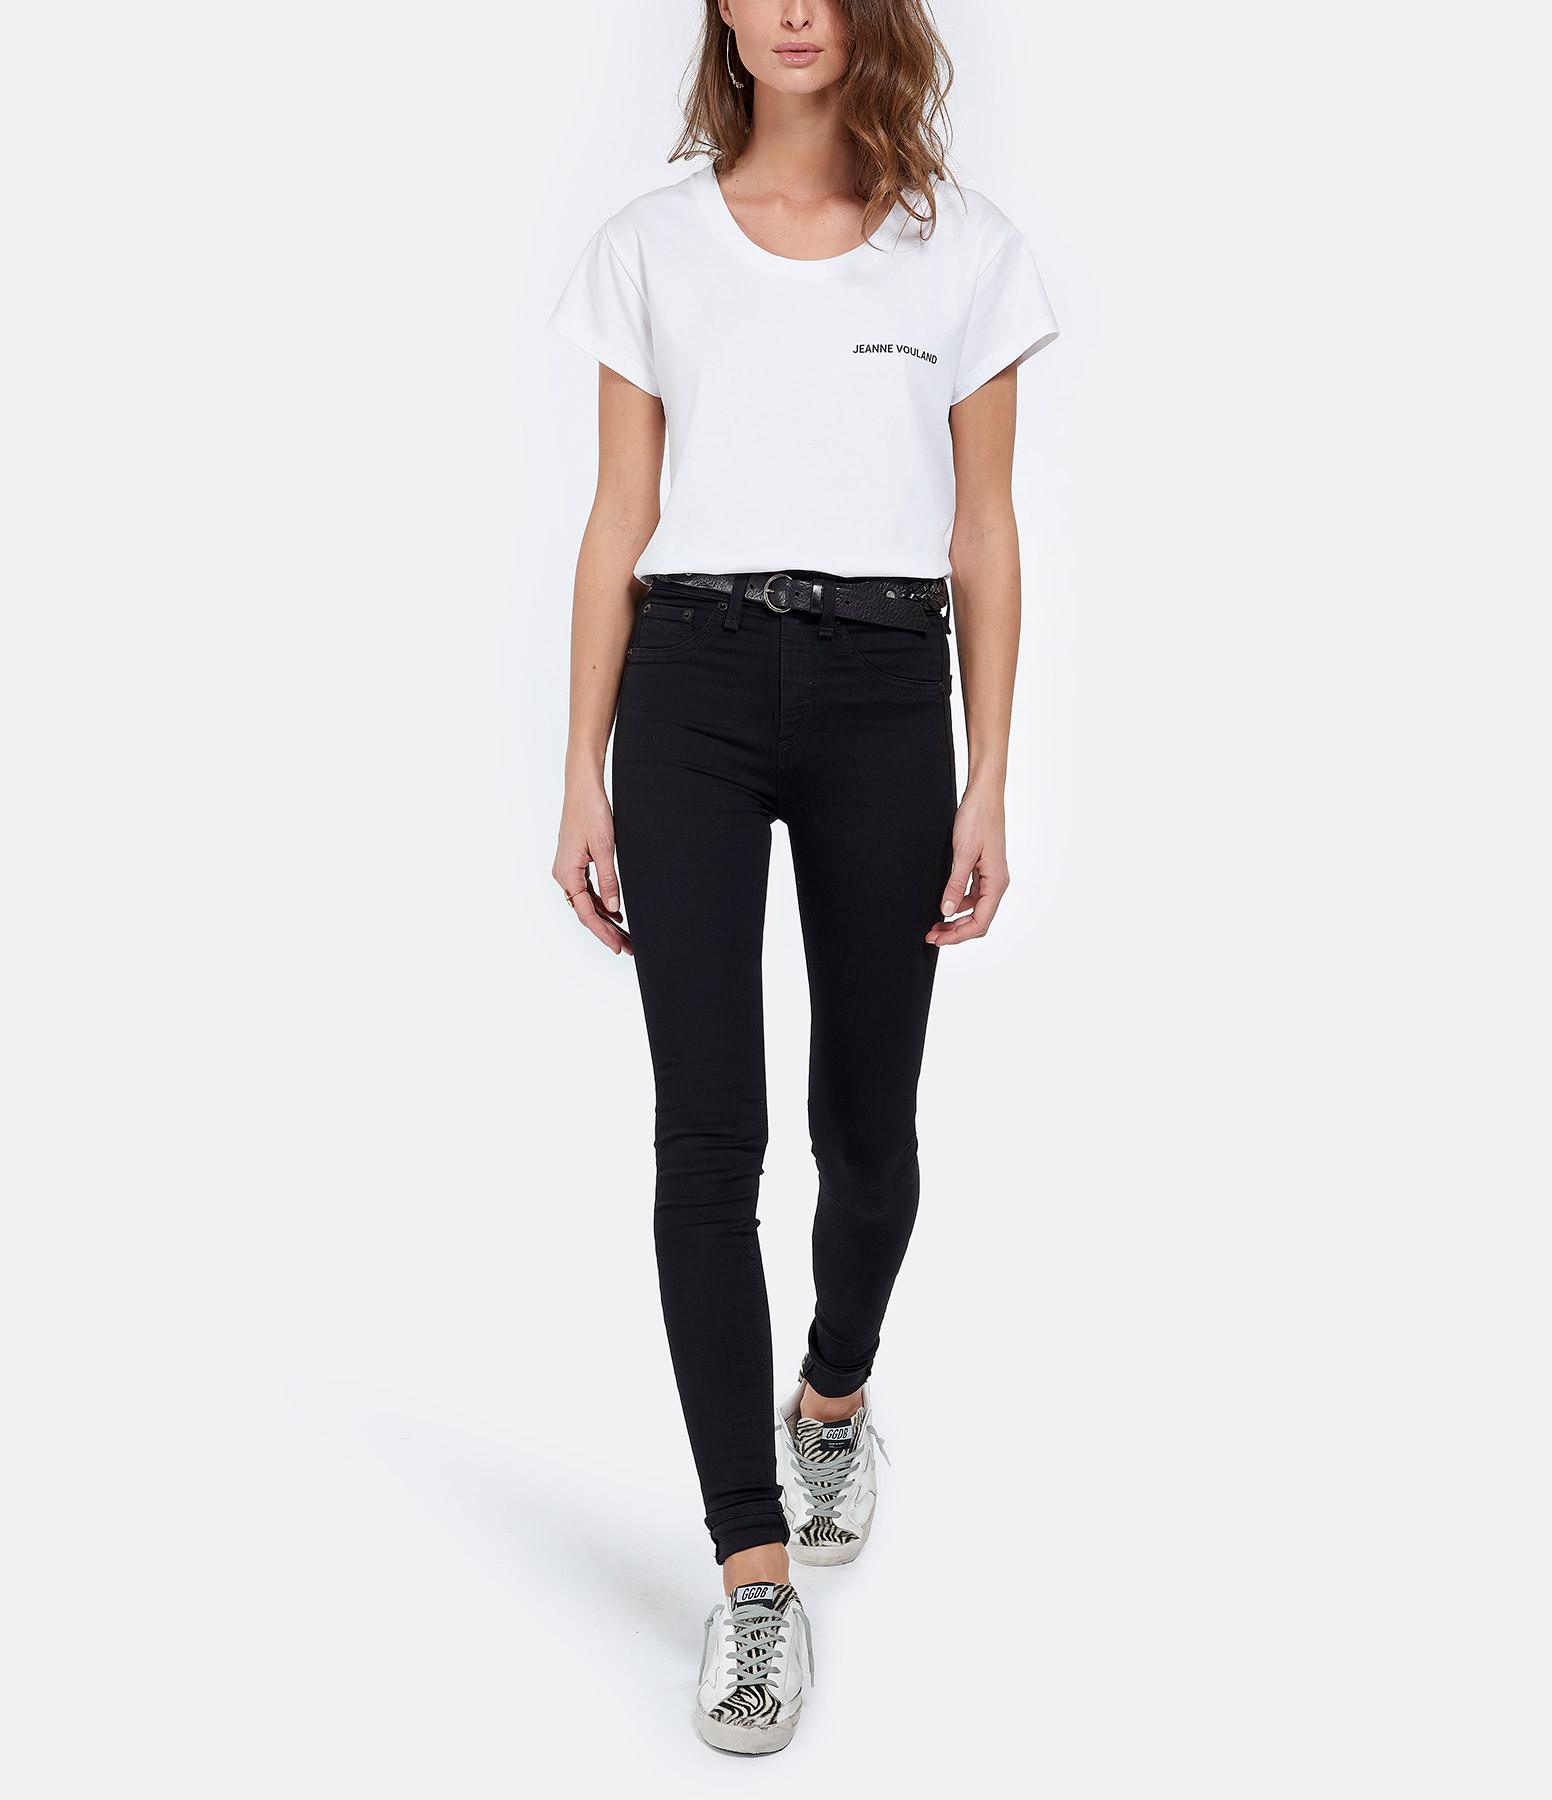 JEANNE VOULAND - Tee-shirt Ari JV Col Rond Blanc Imprimé Noir